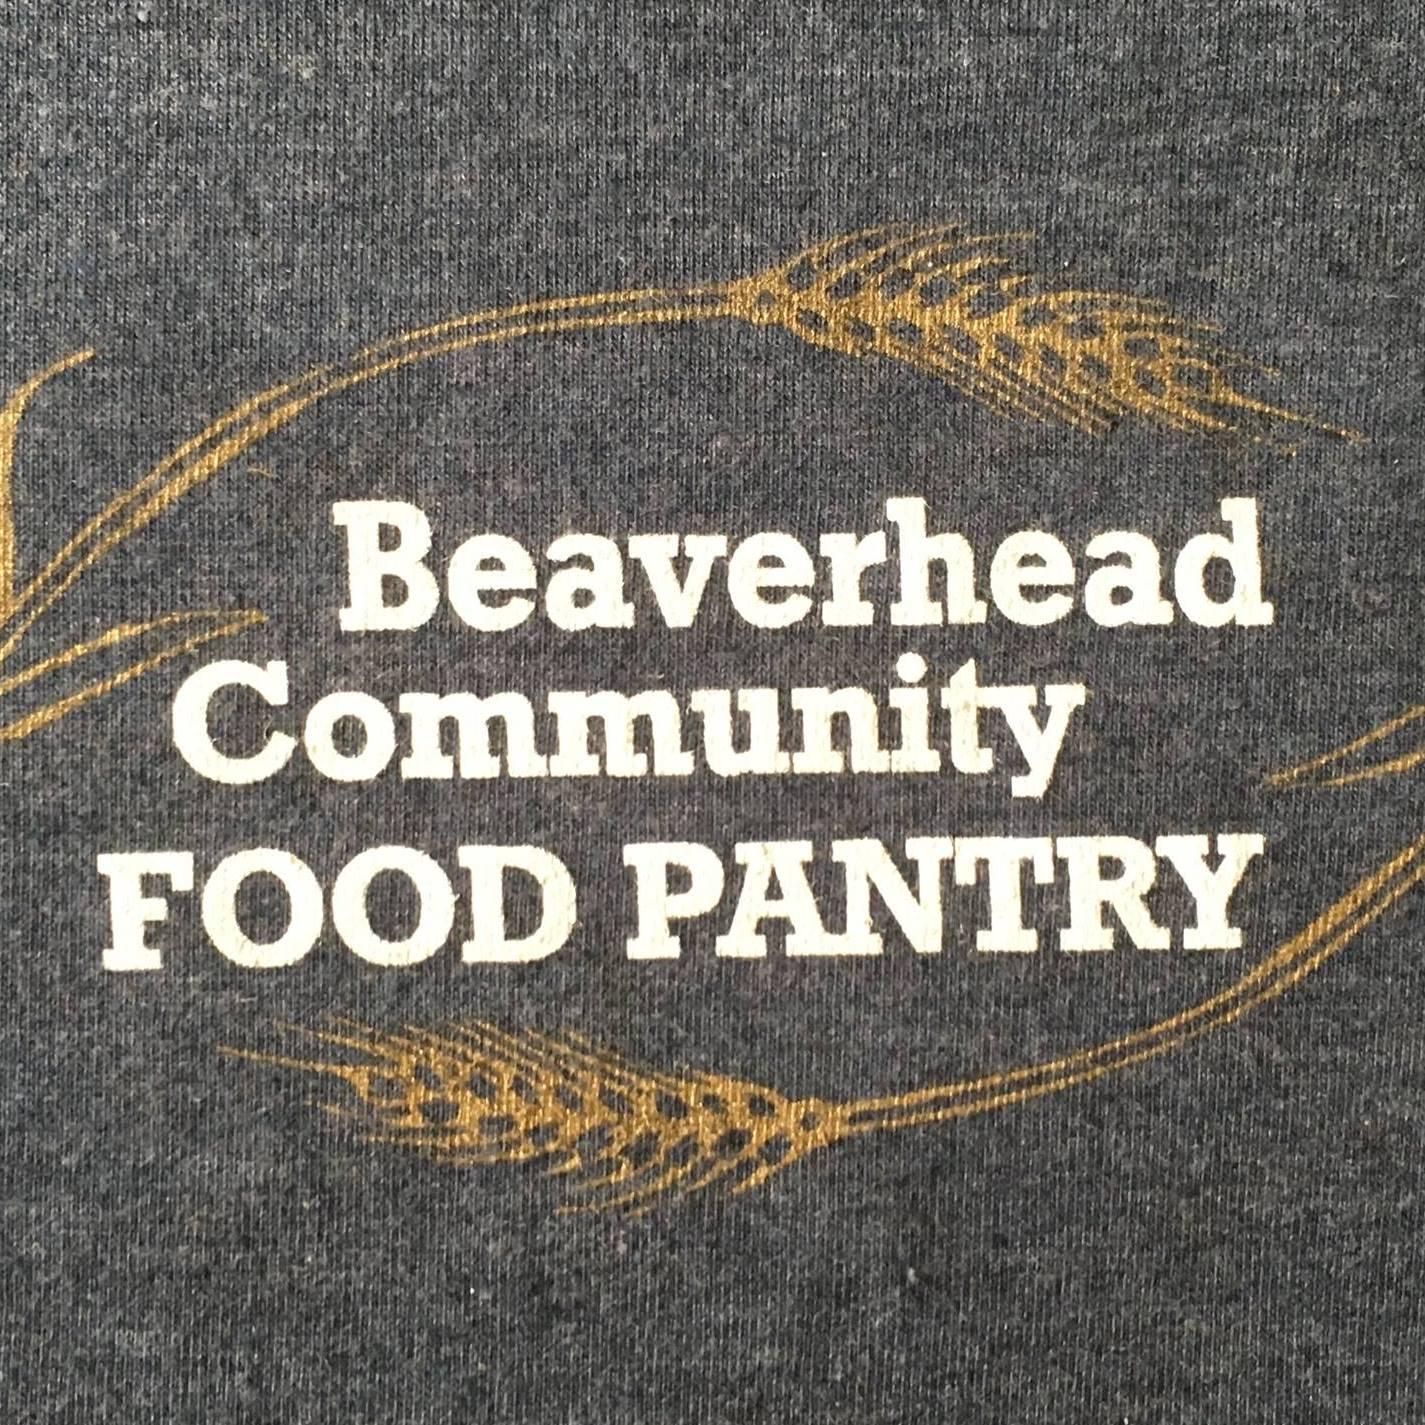 Beaverhead Community Food Pantry